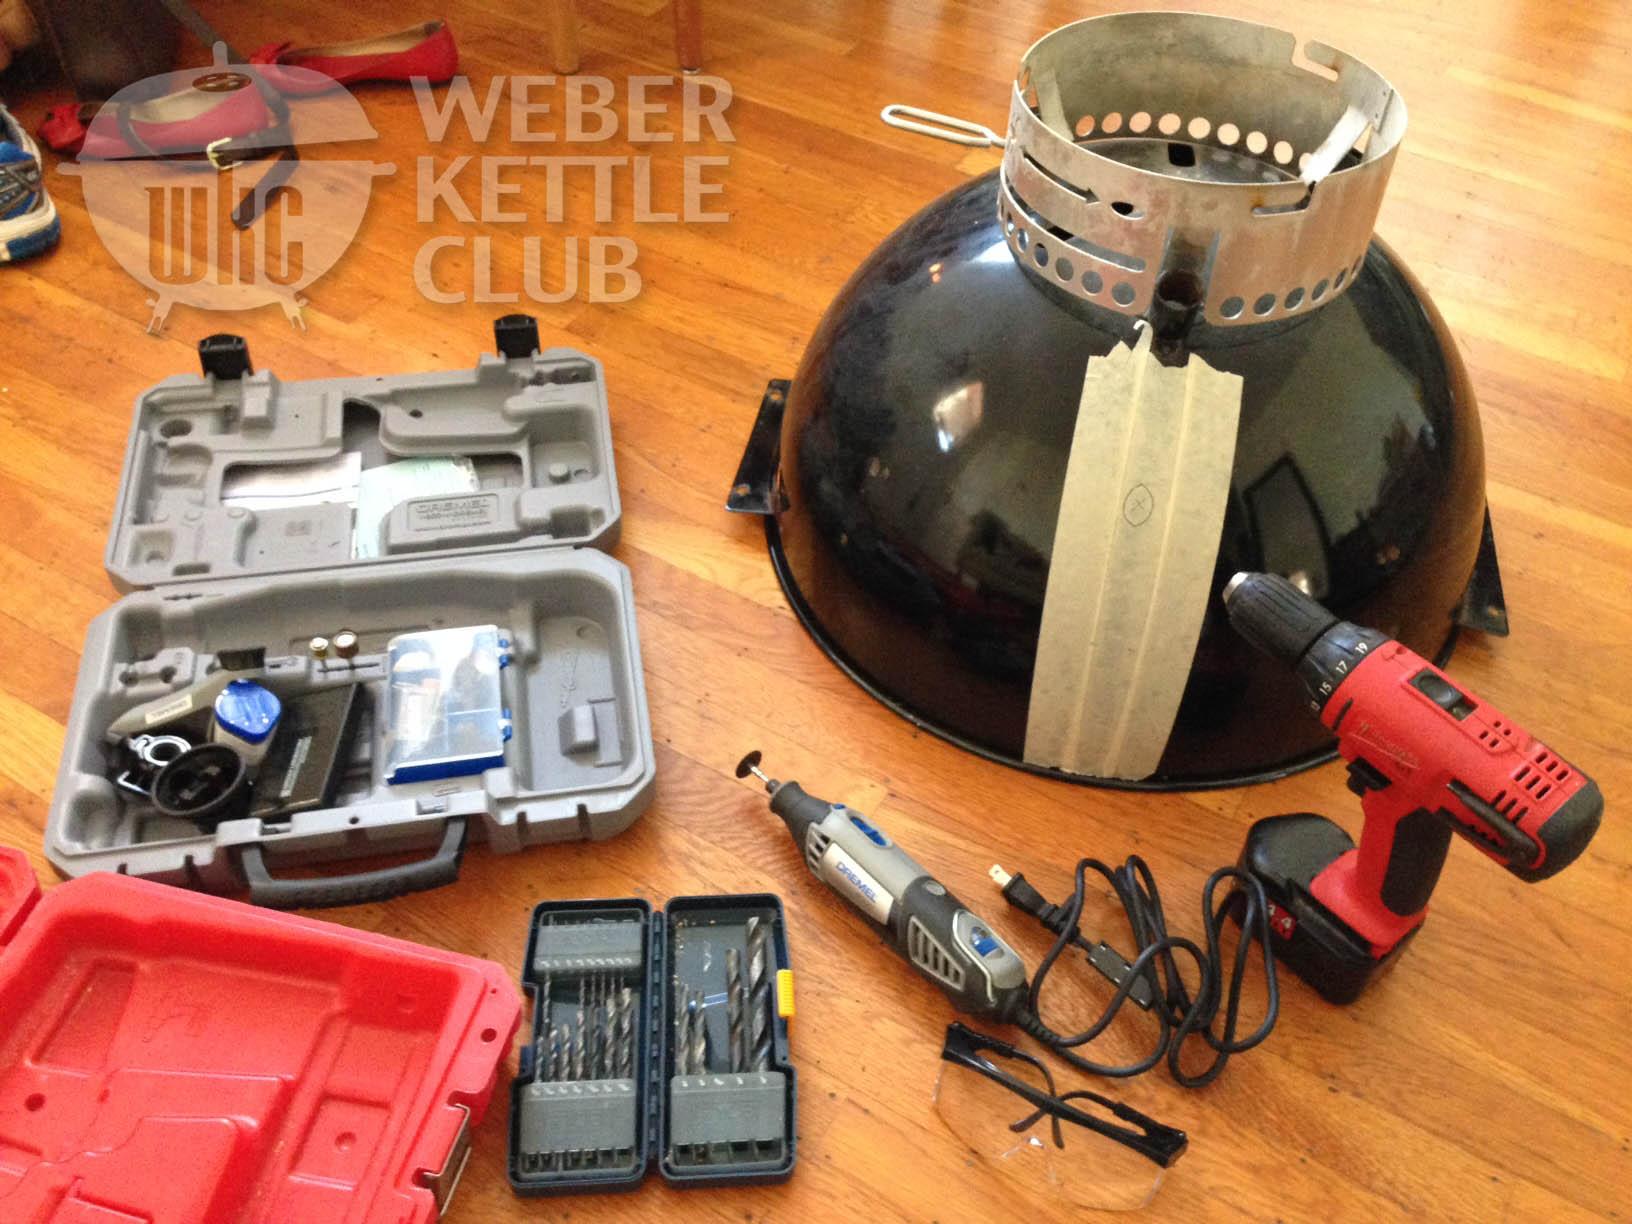 Weber Grill Mod Adding Gas Assist Weber Kettle Club